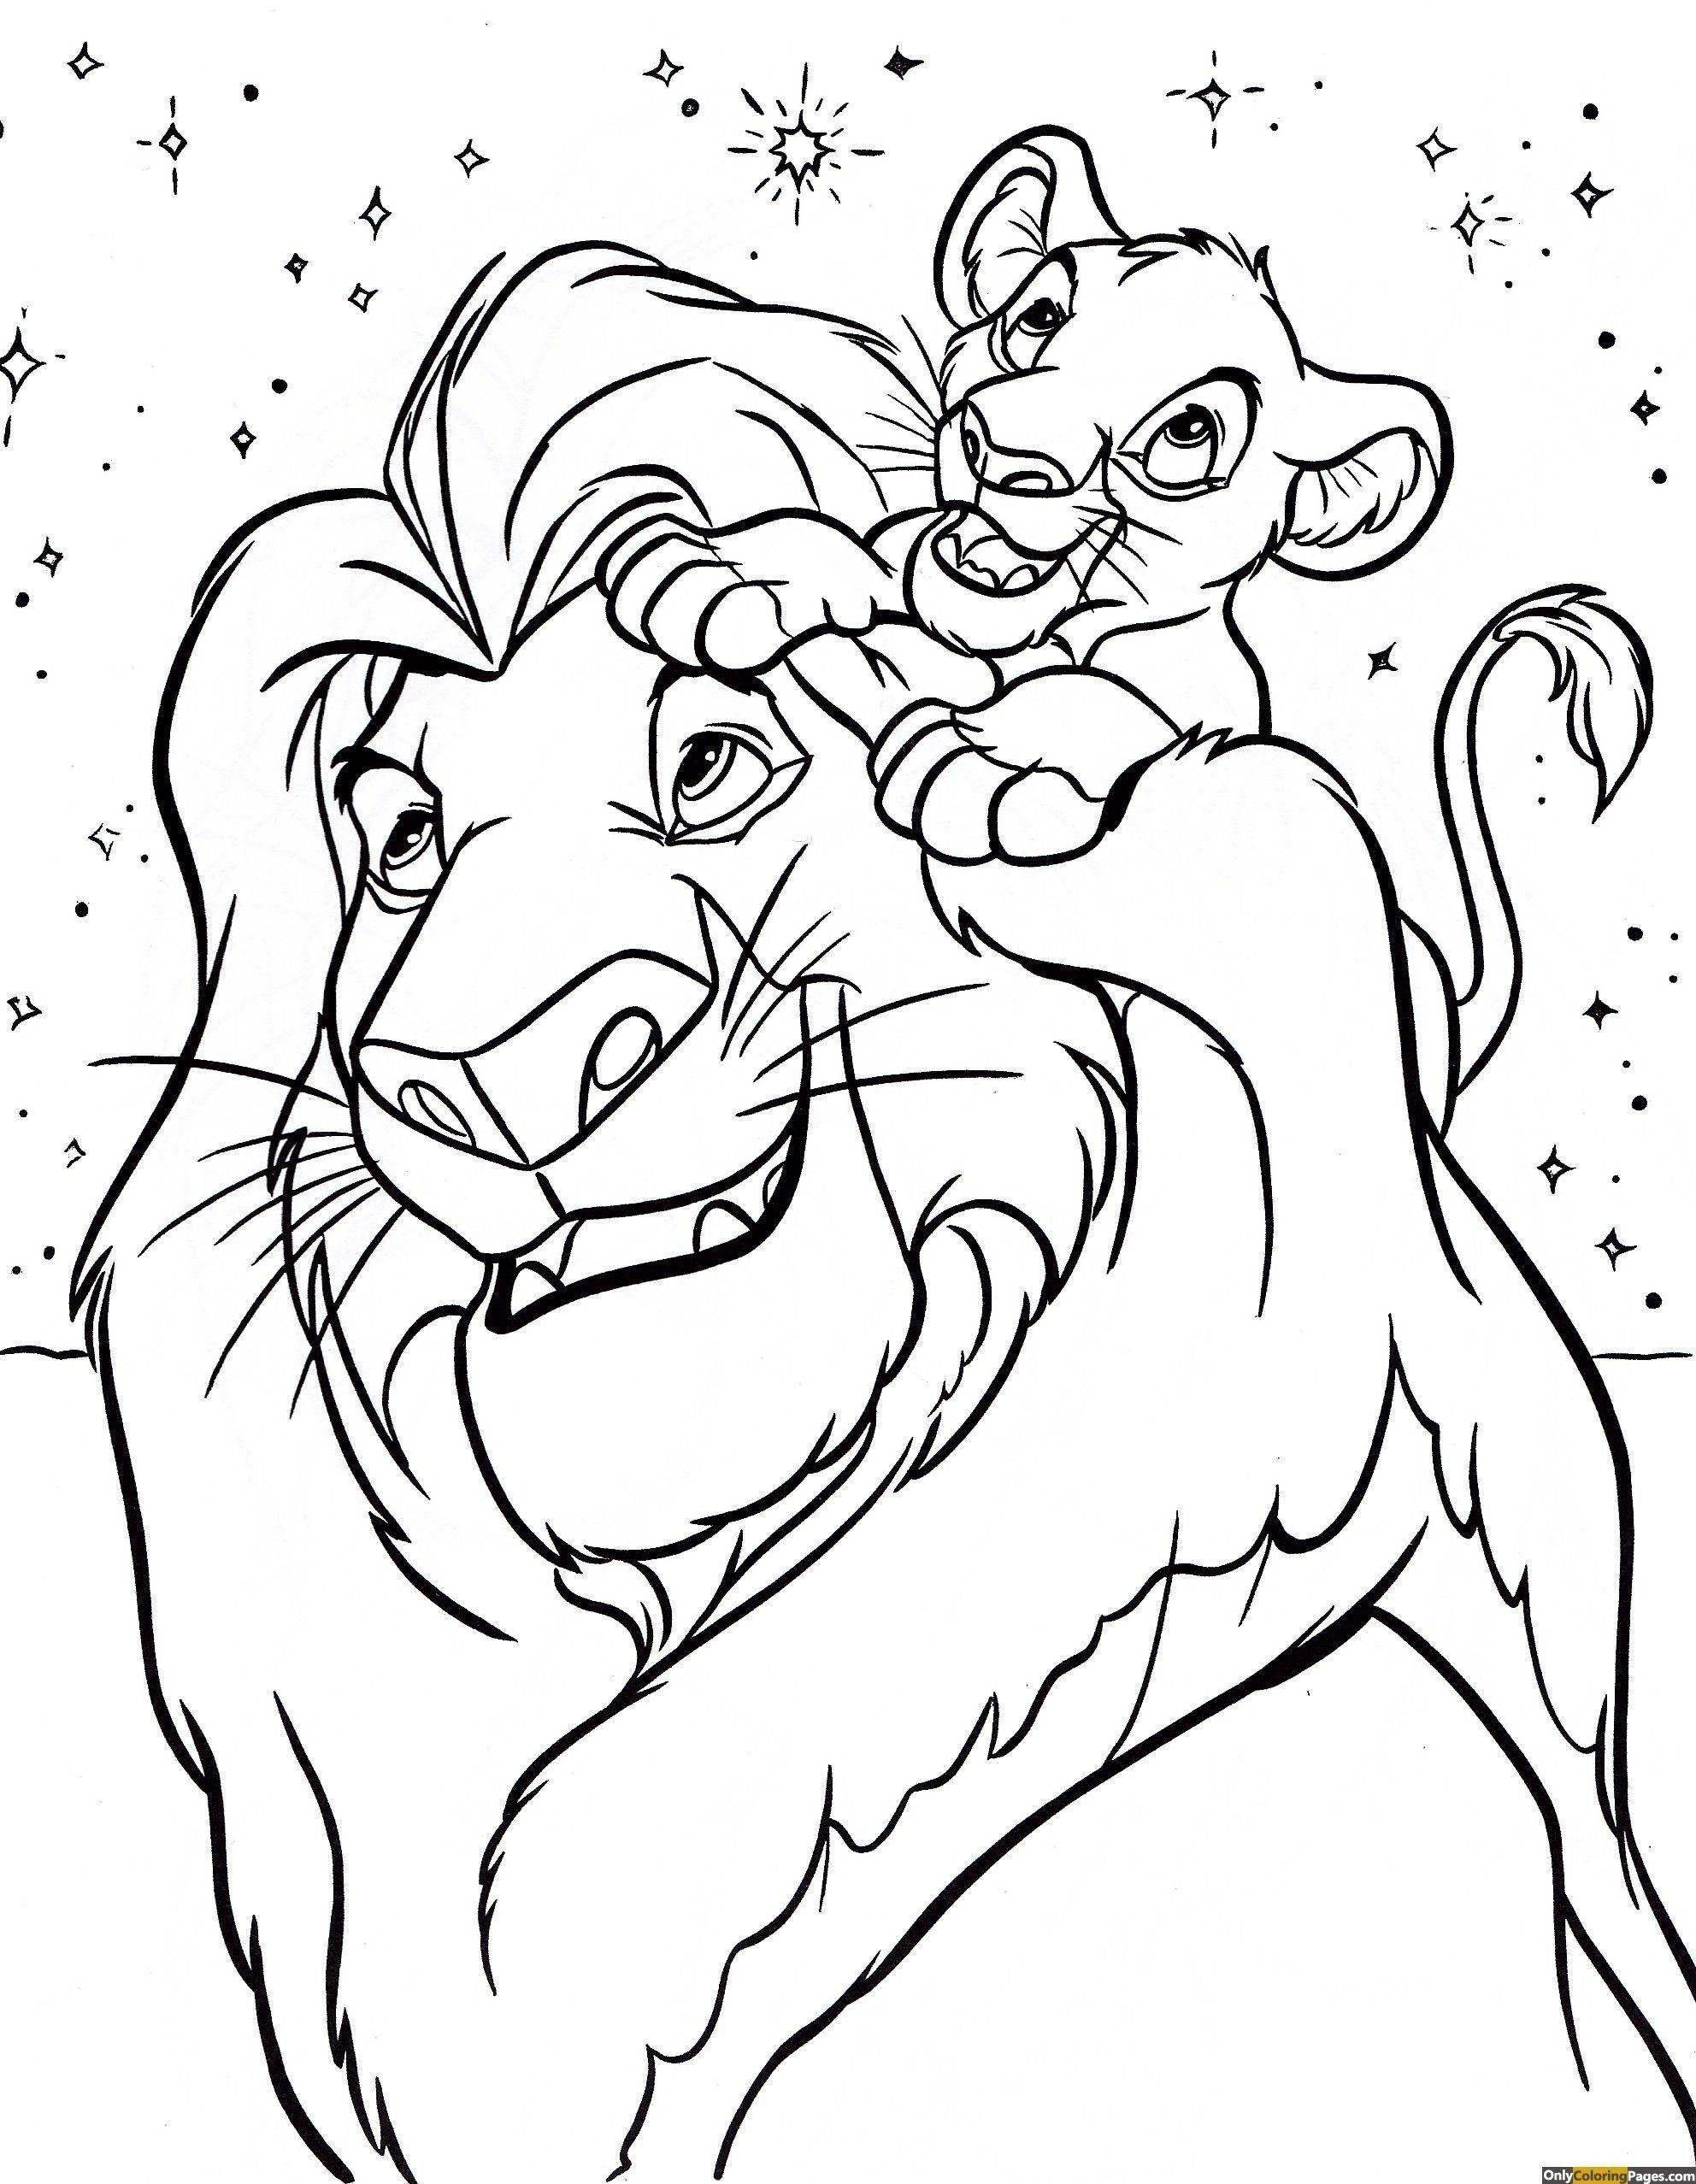 Disney Free Coloring Pages Coloring Pages Coloring Descendants Book Pdf Disney Free Lion Coloring Pages Disney Coloring Sheets Disney Coloring Pages